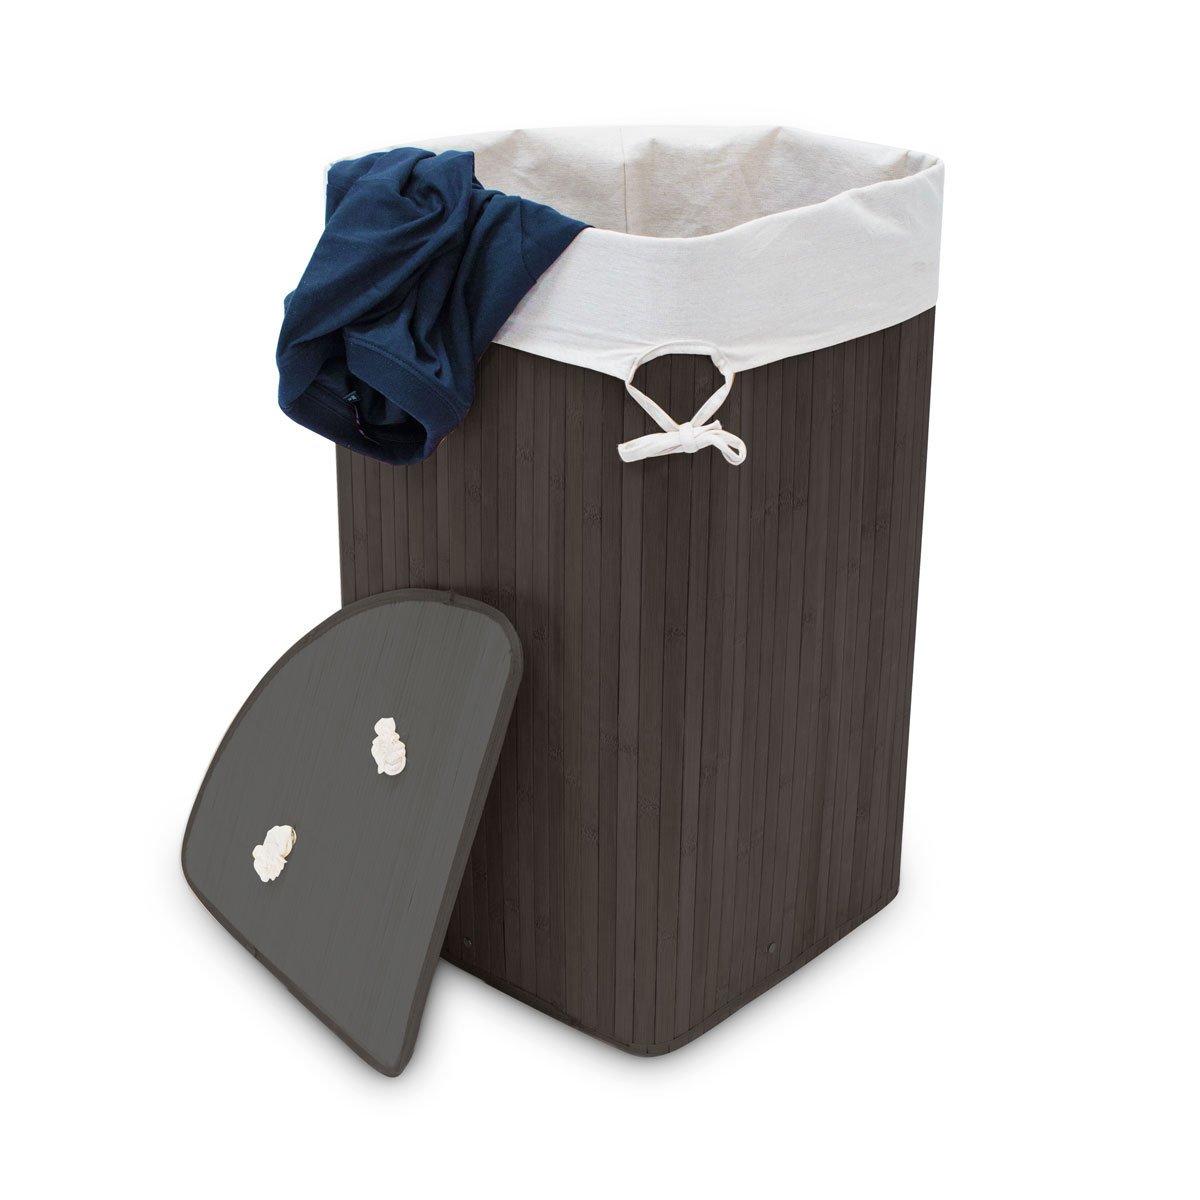 65 x 49.5 x 37 cm Folding Hamper with Laundry Sack 64L Black Relaxdays Bamboo Corner Laundry Basket